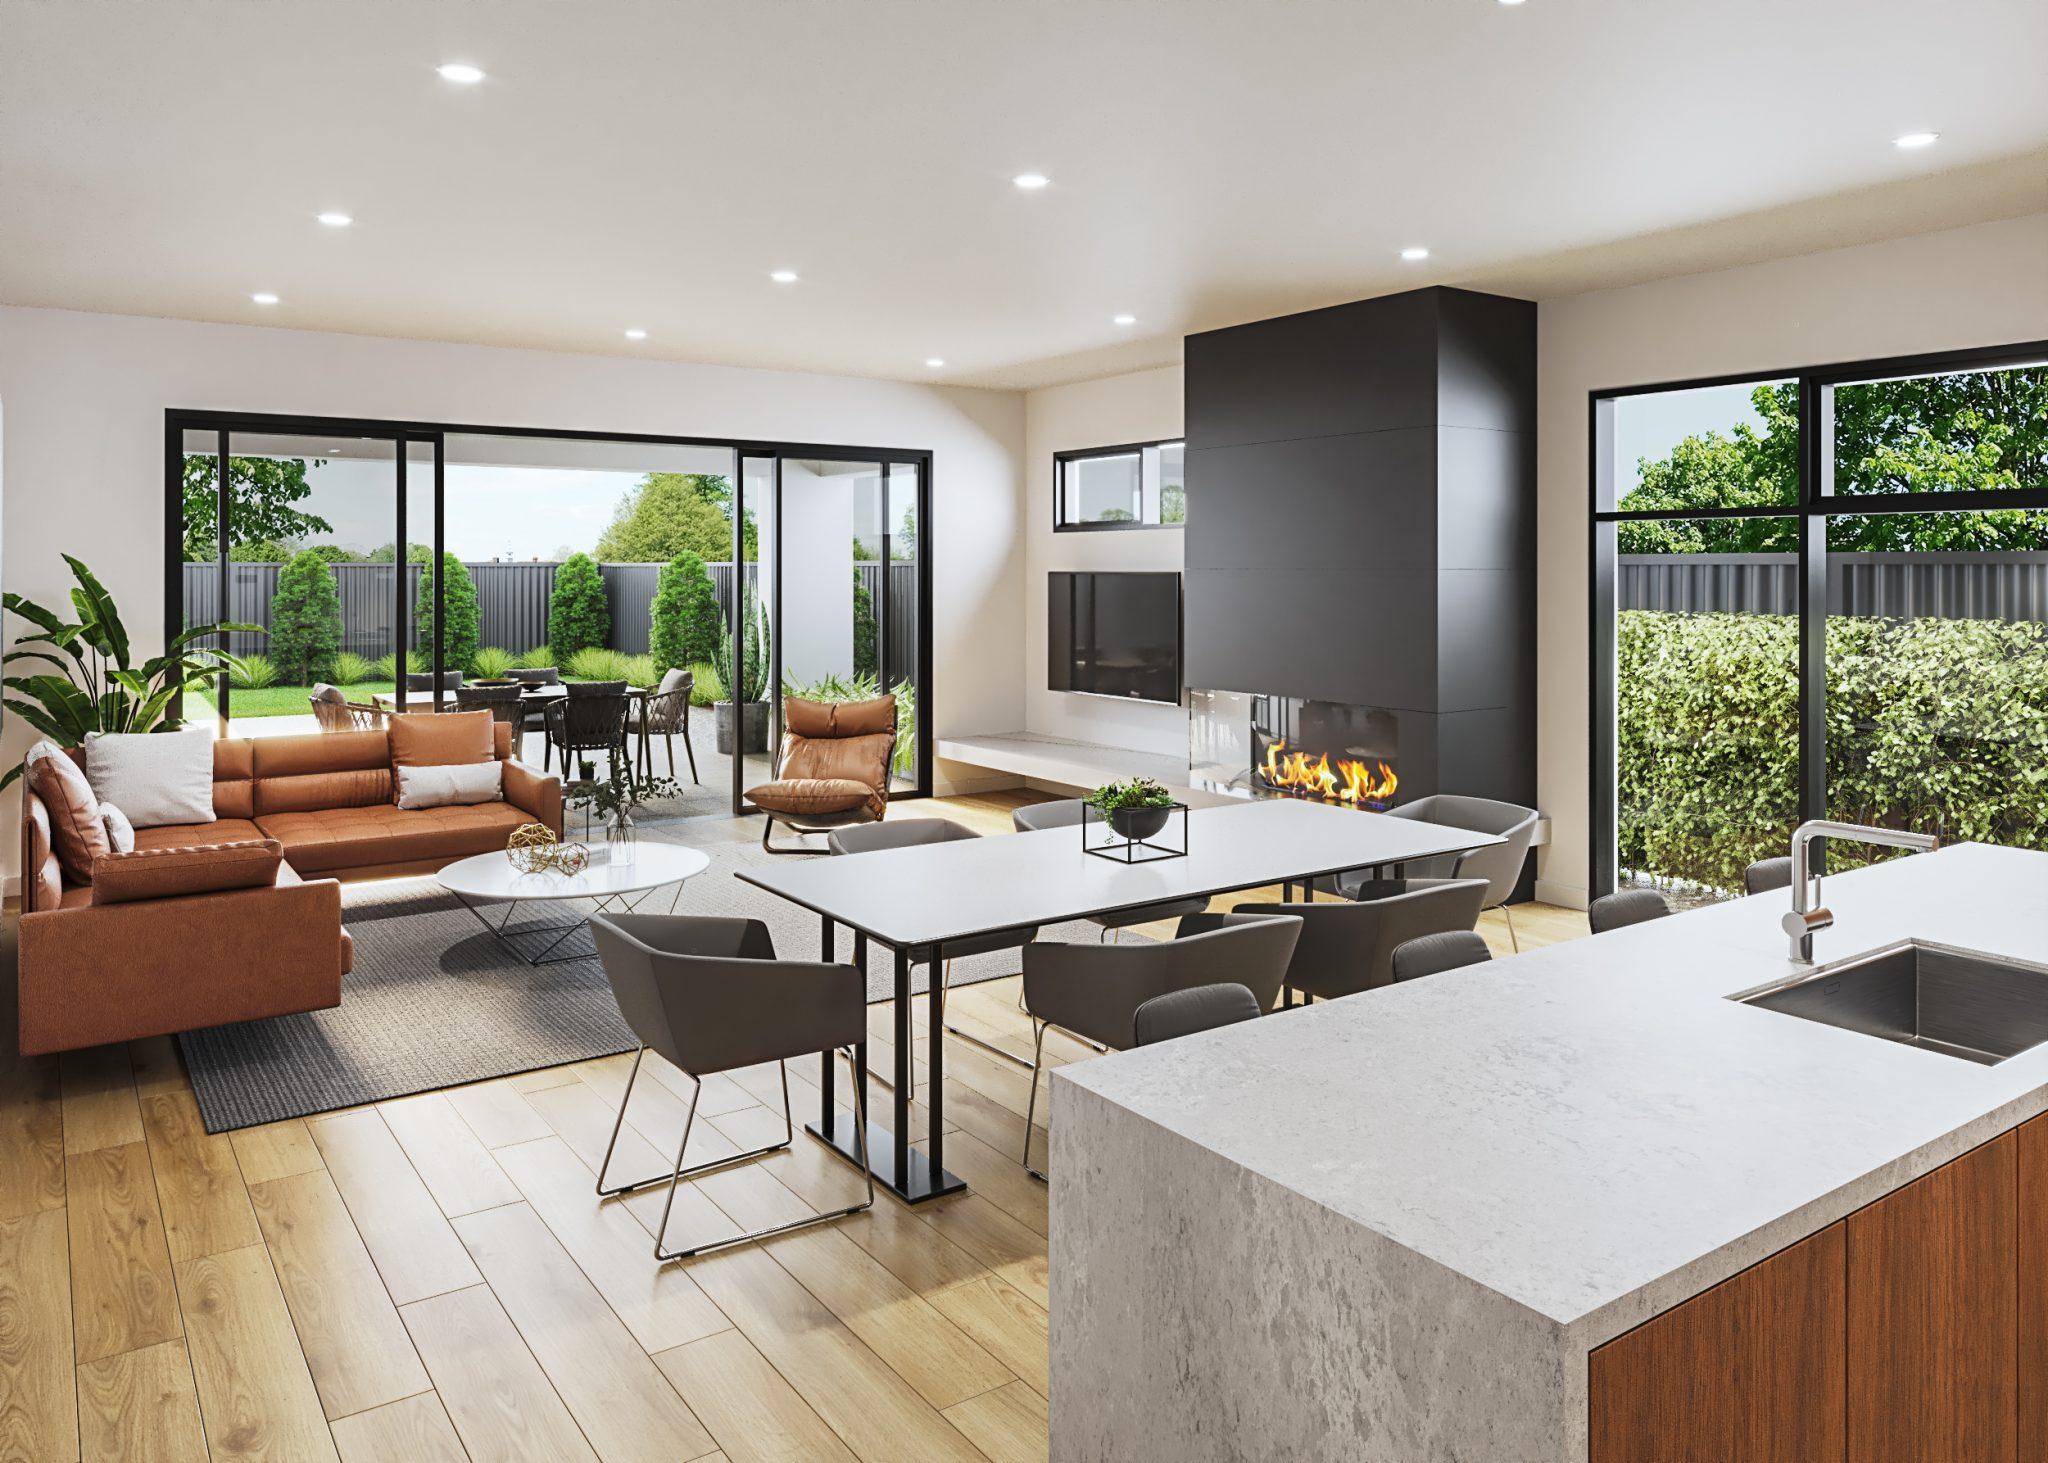 New Custom Home Build in Fulham Gardens